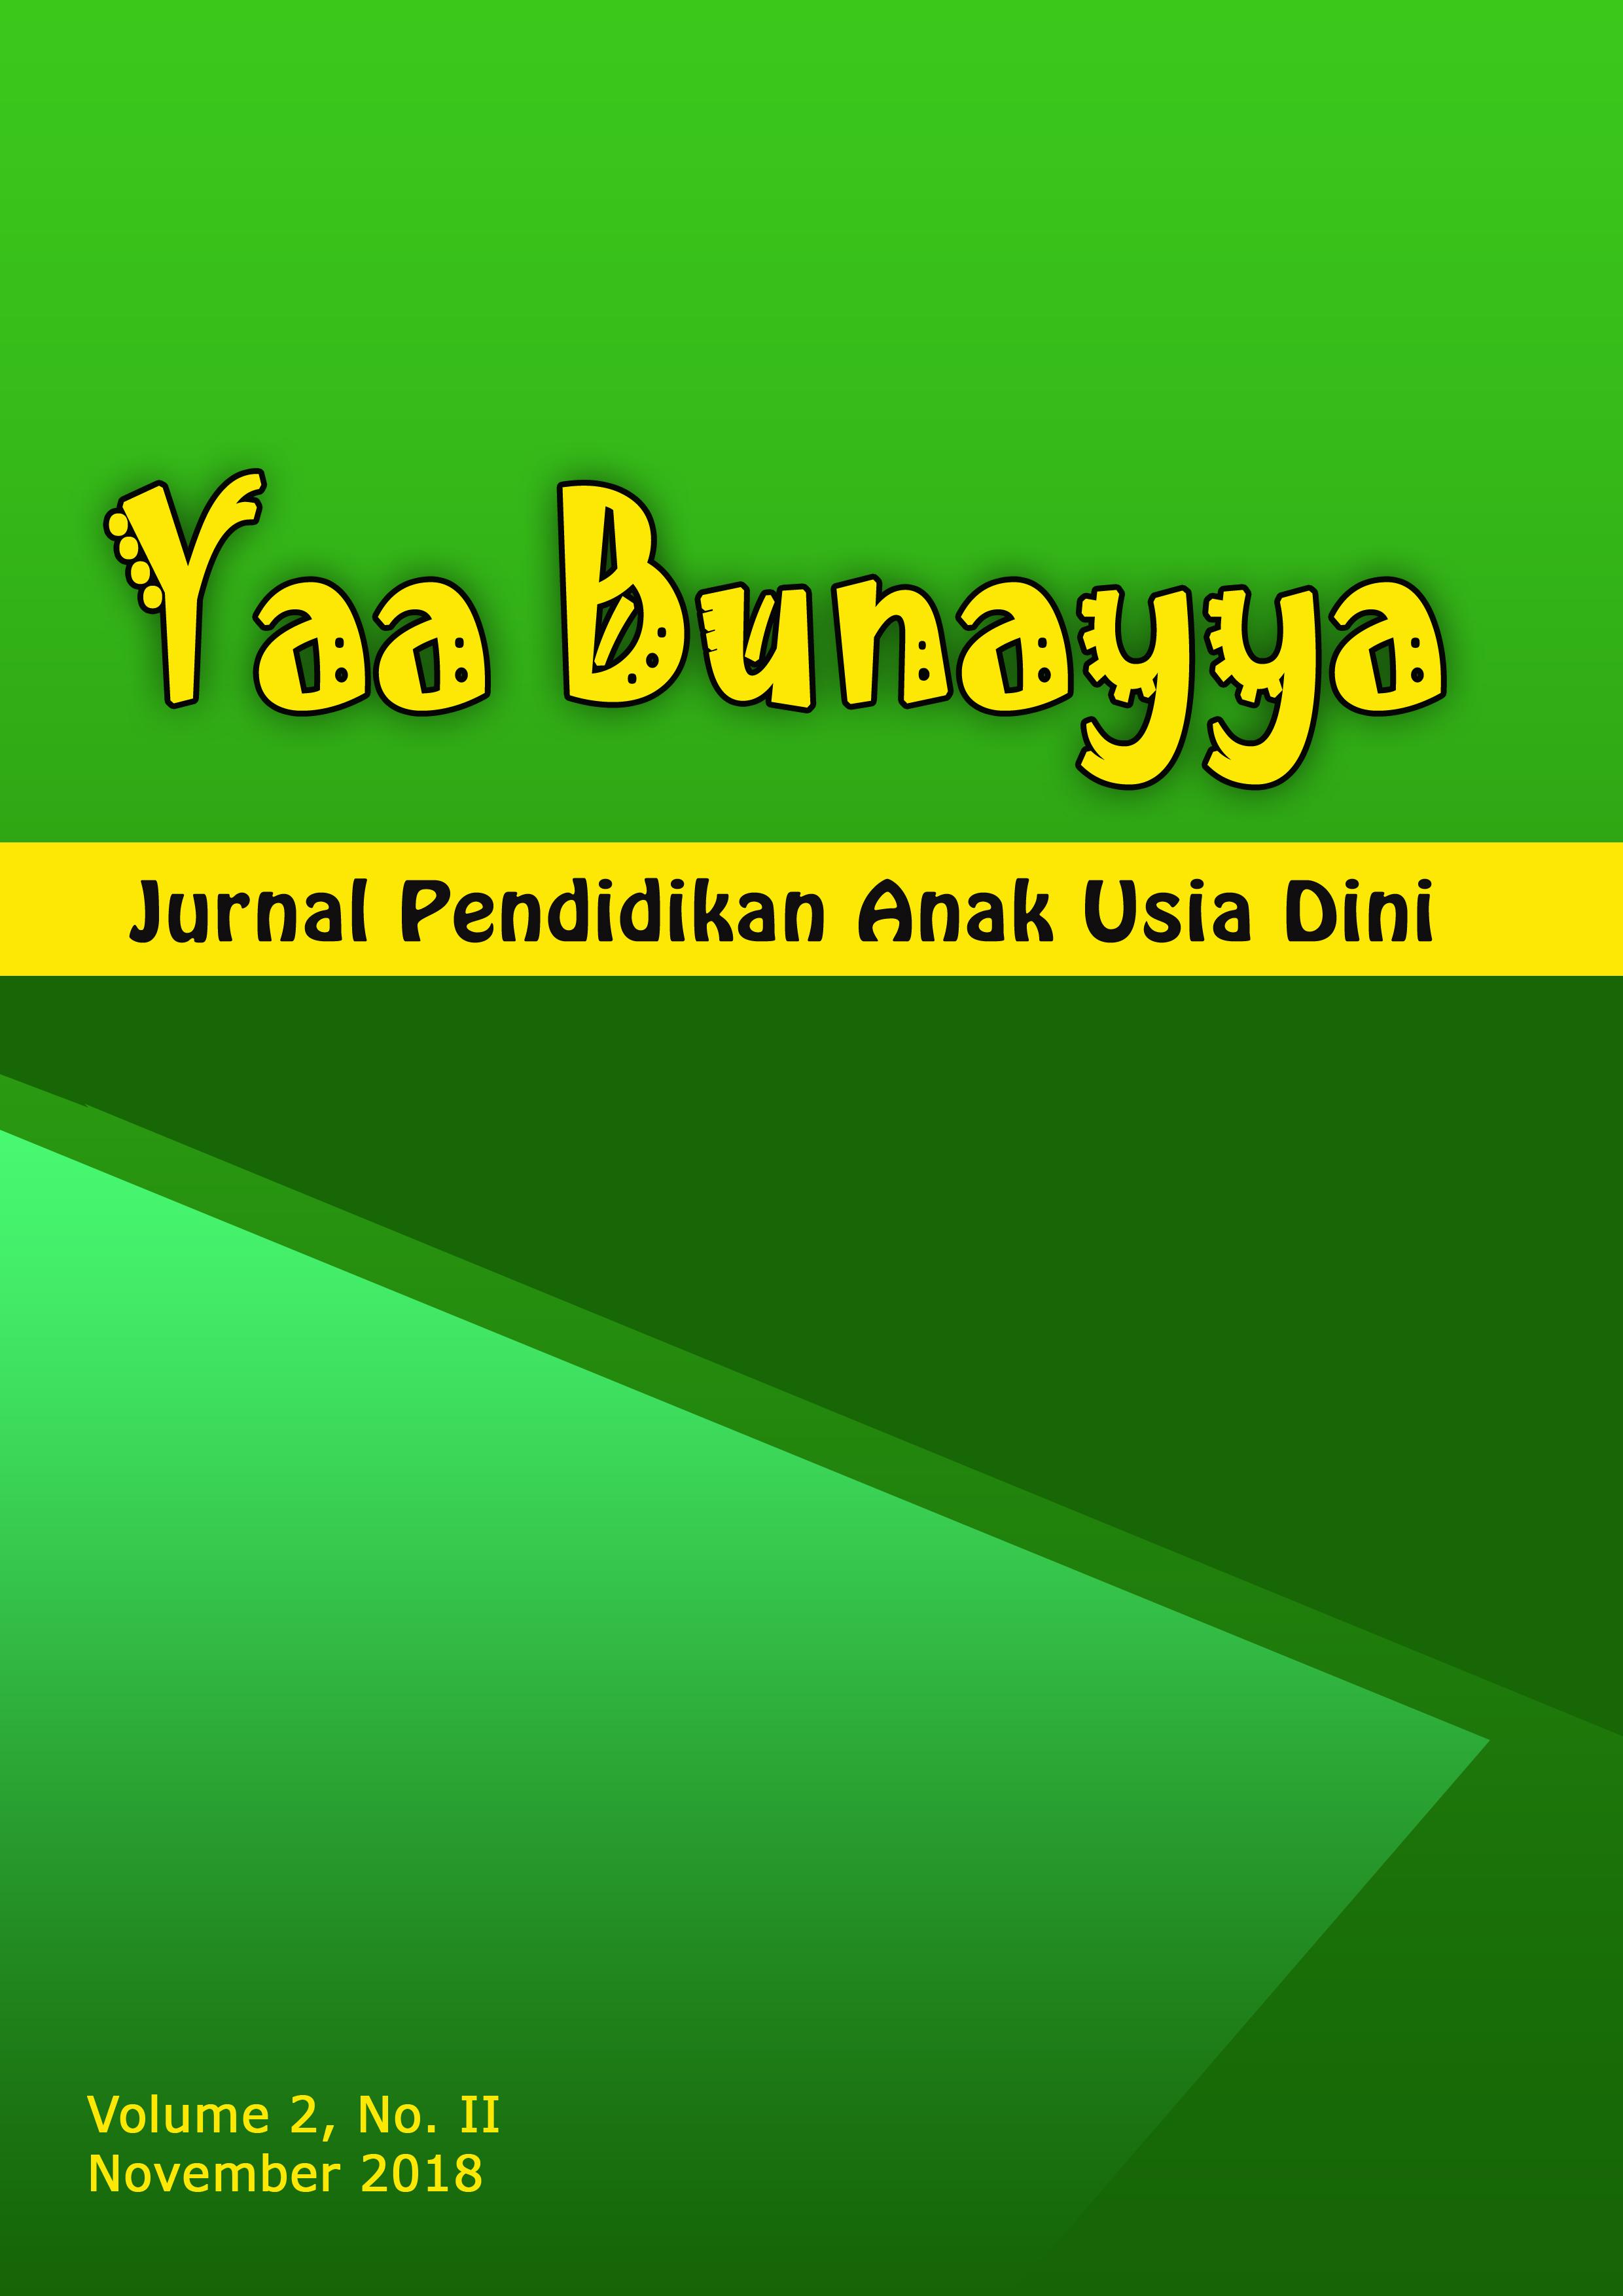 Yaa Bunayya Jurnal Pendidikan Anak Usia Dini